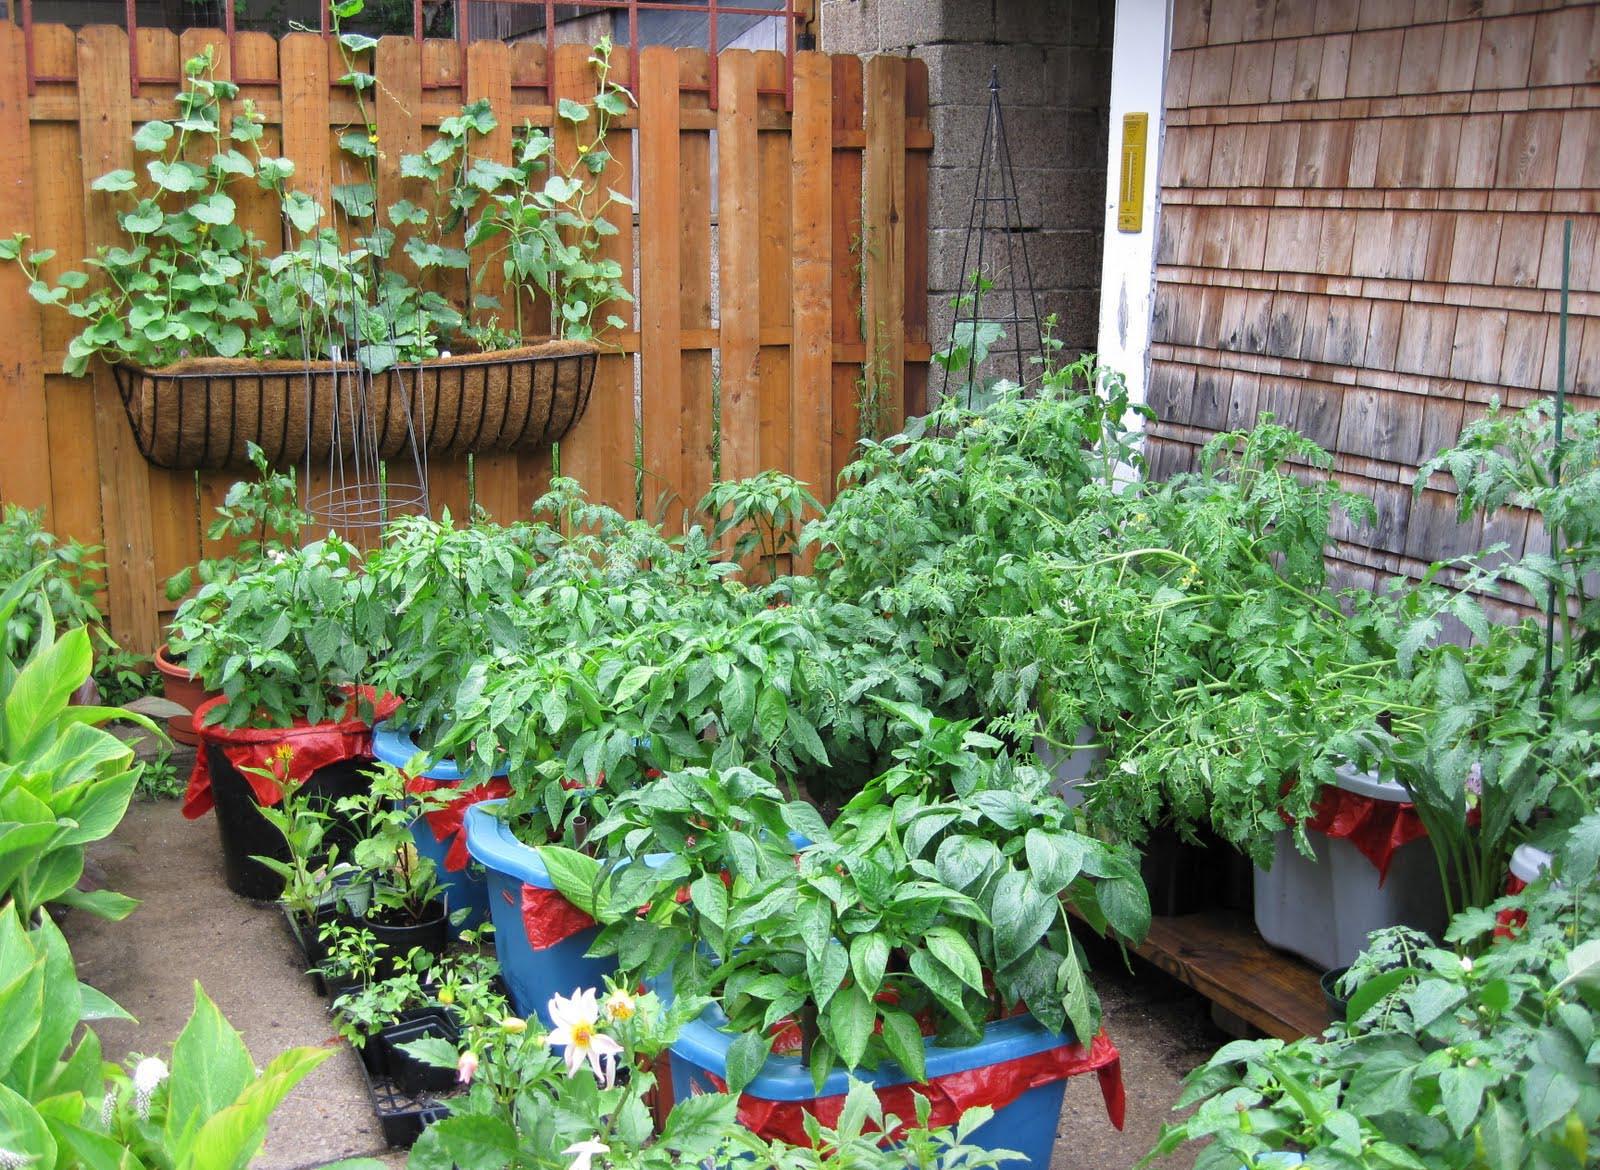 Herb Garden in a Pot